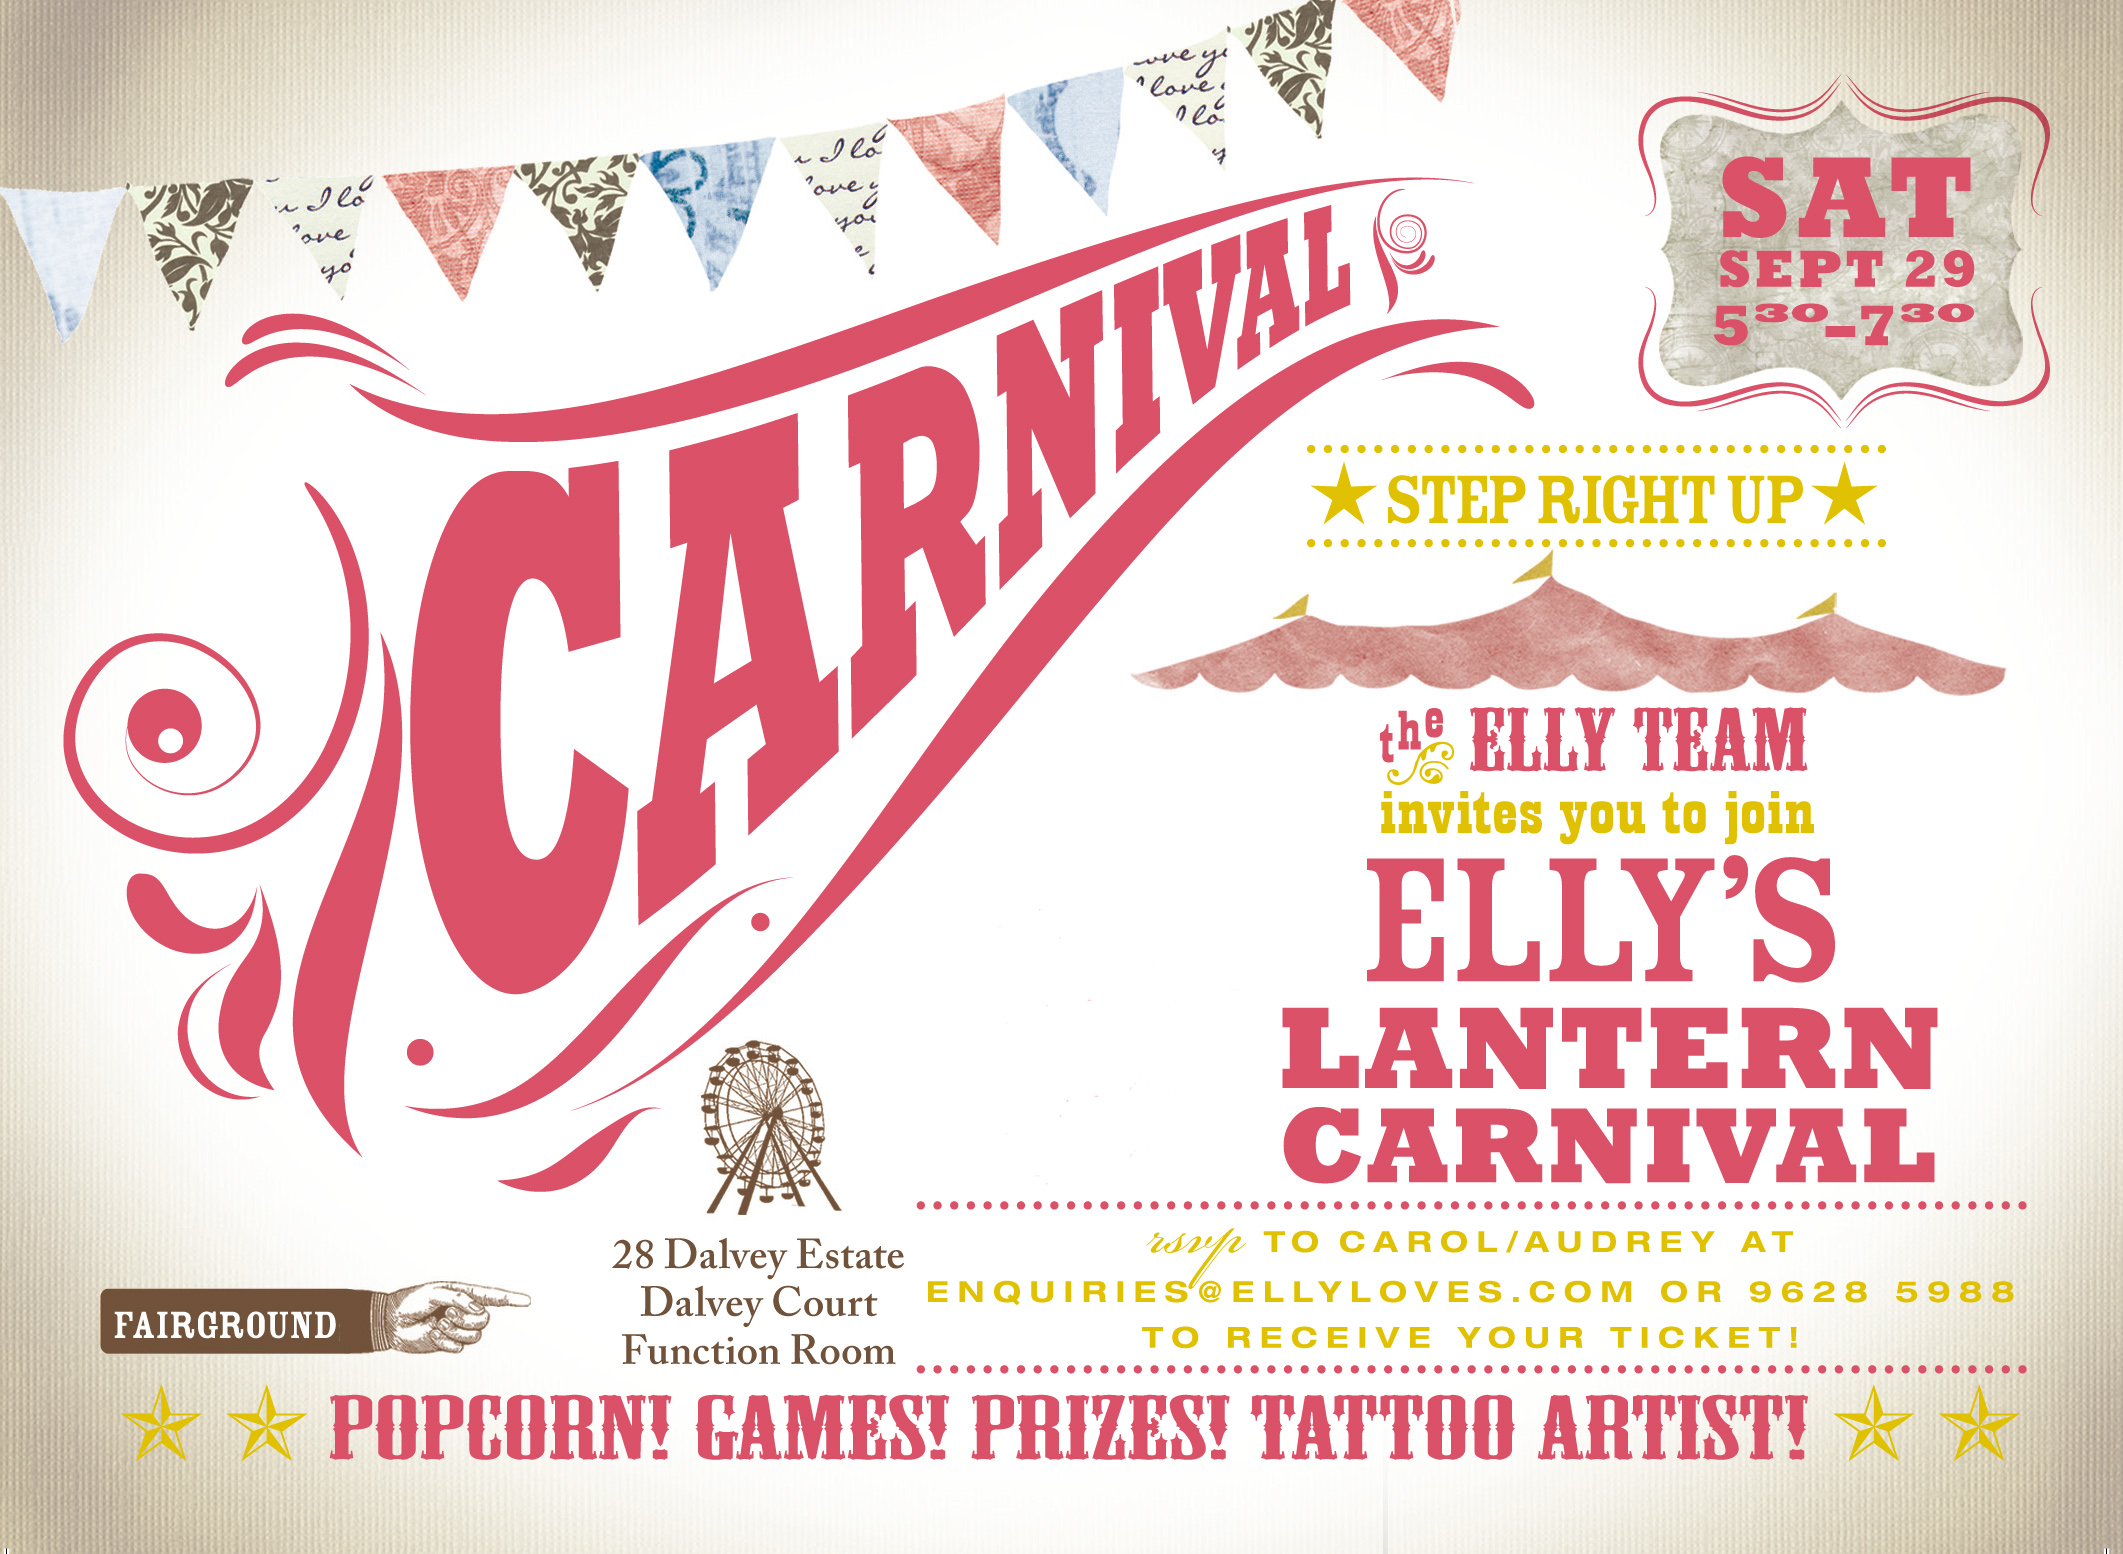 Lantern Festival | The Elly Blog